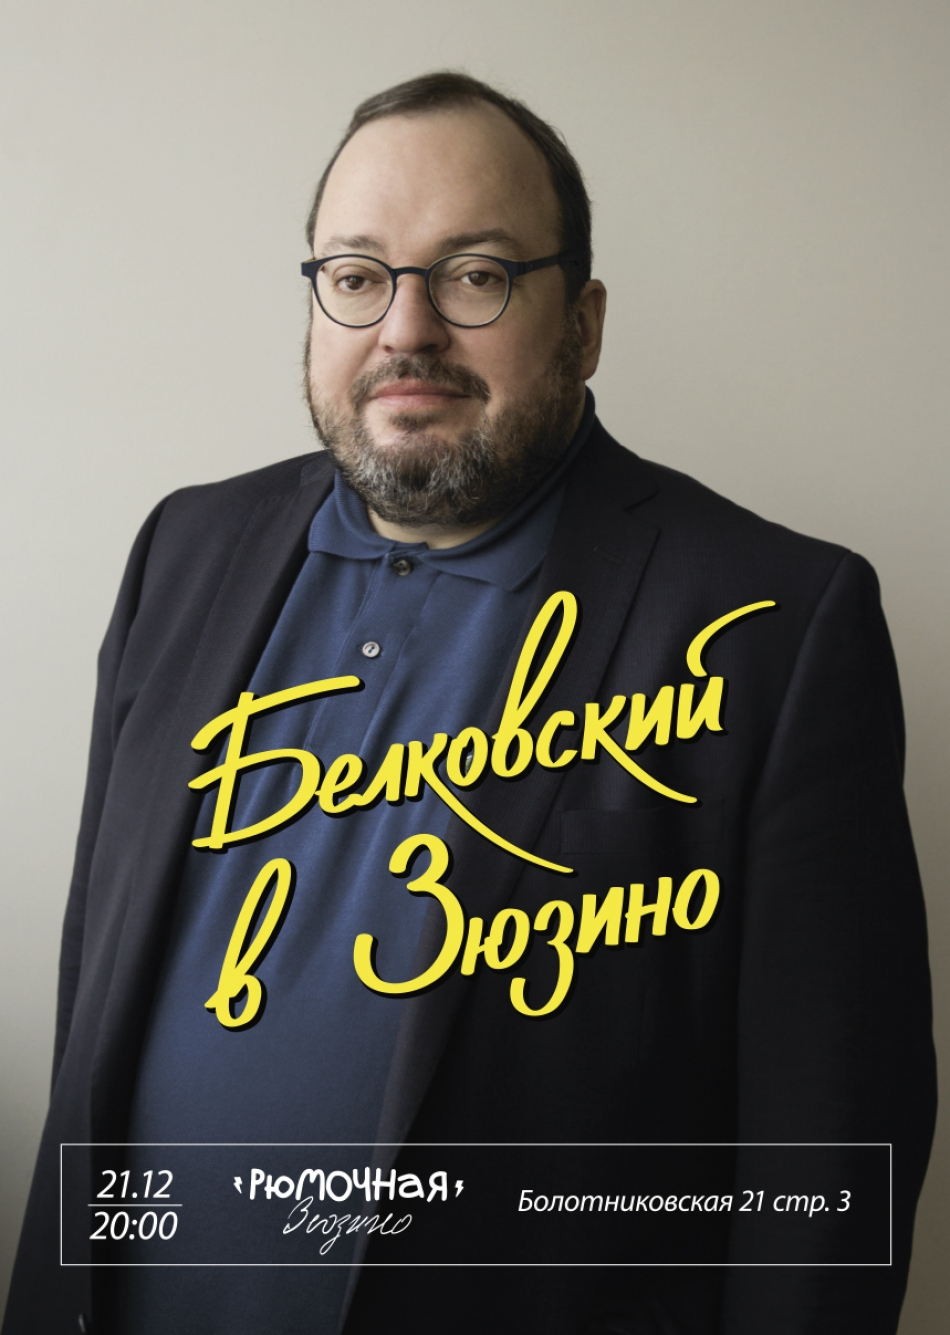 Белковский в Зюзино